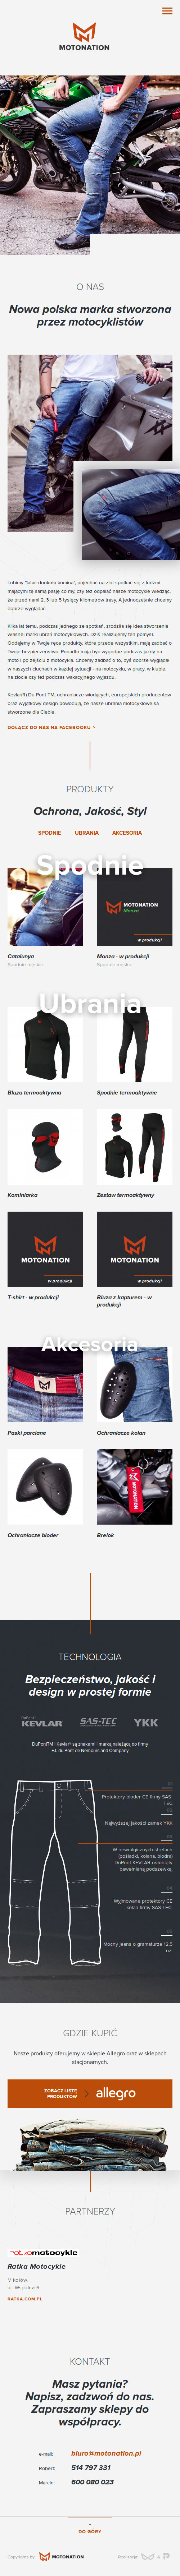 MotoNation